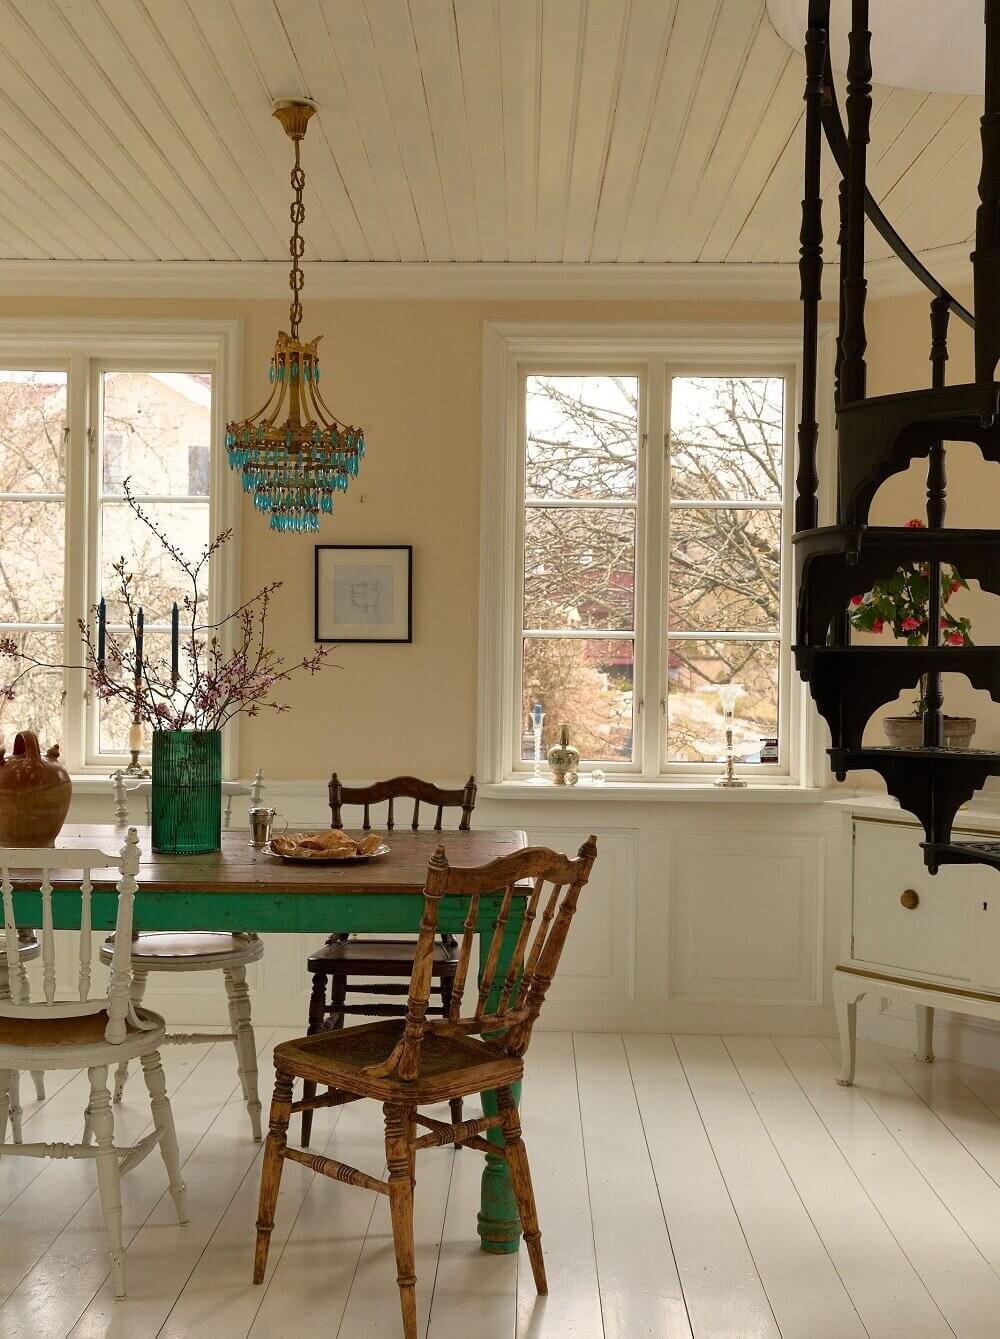 idyllic-swedish-house-tower-room-nordroom